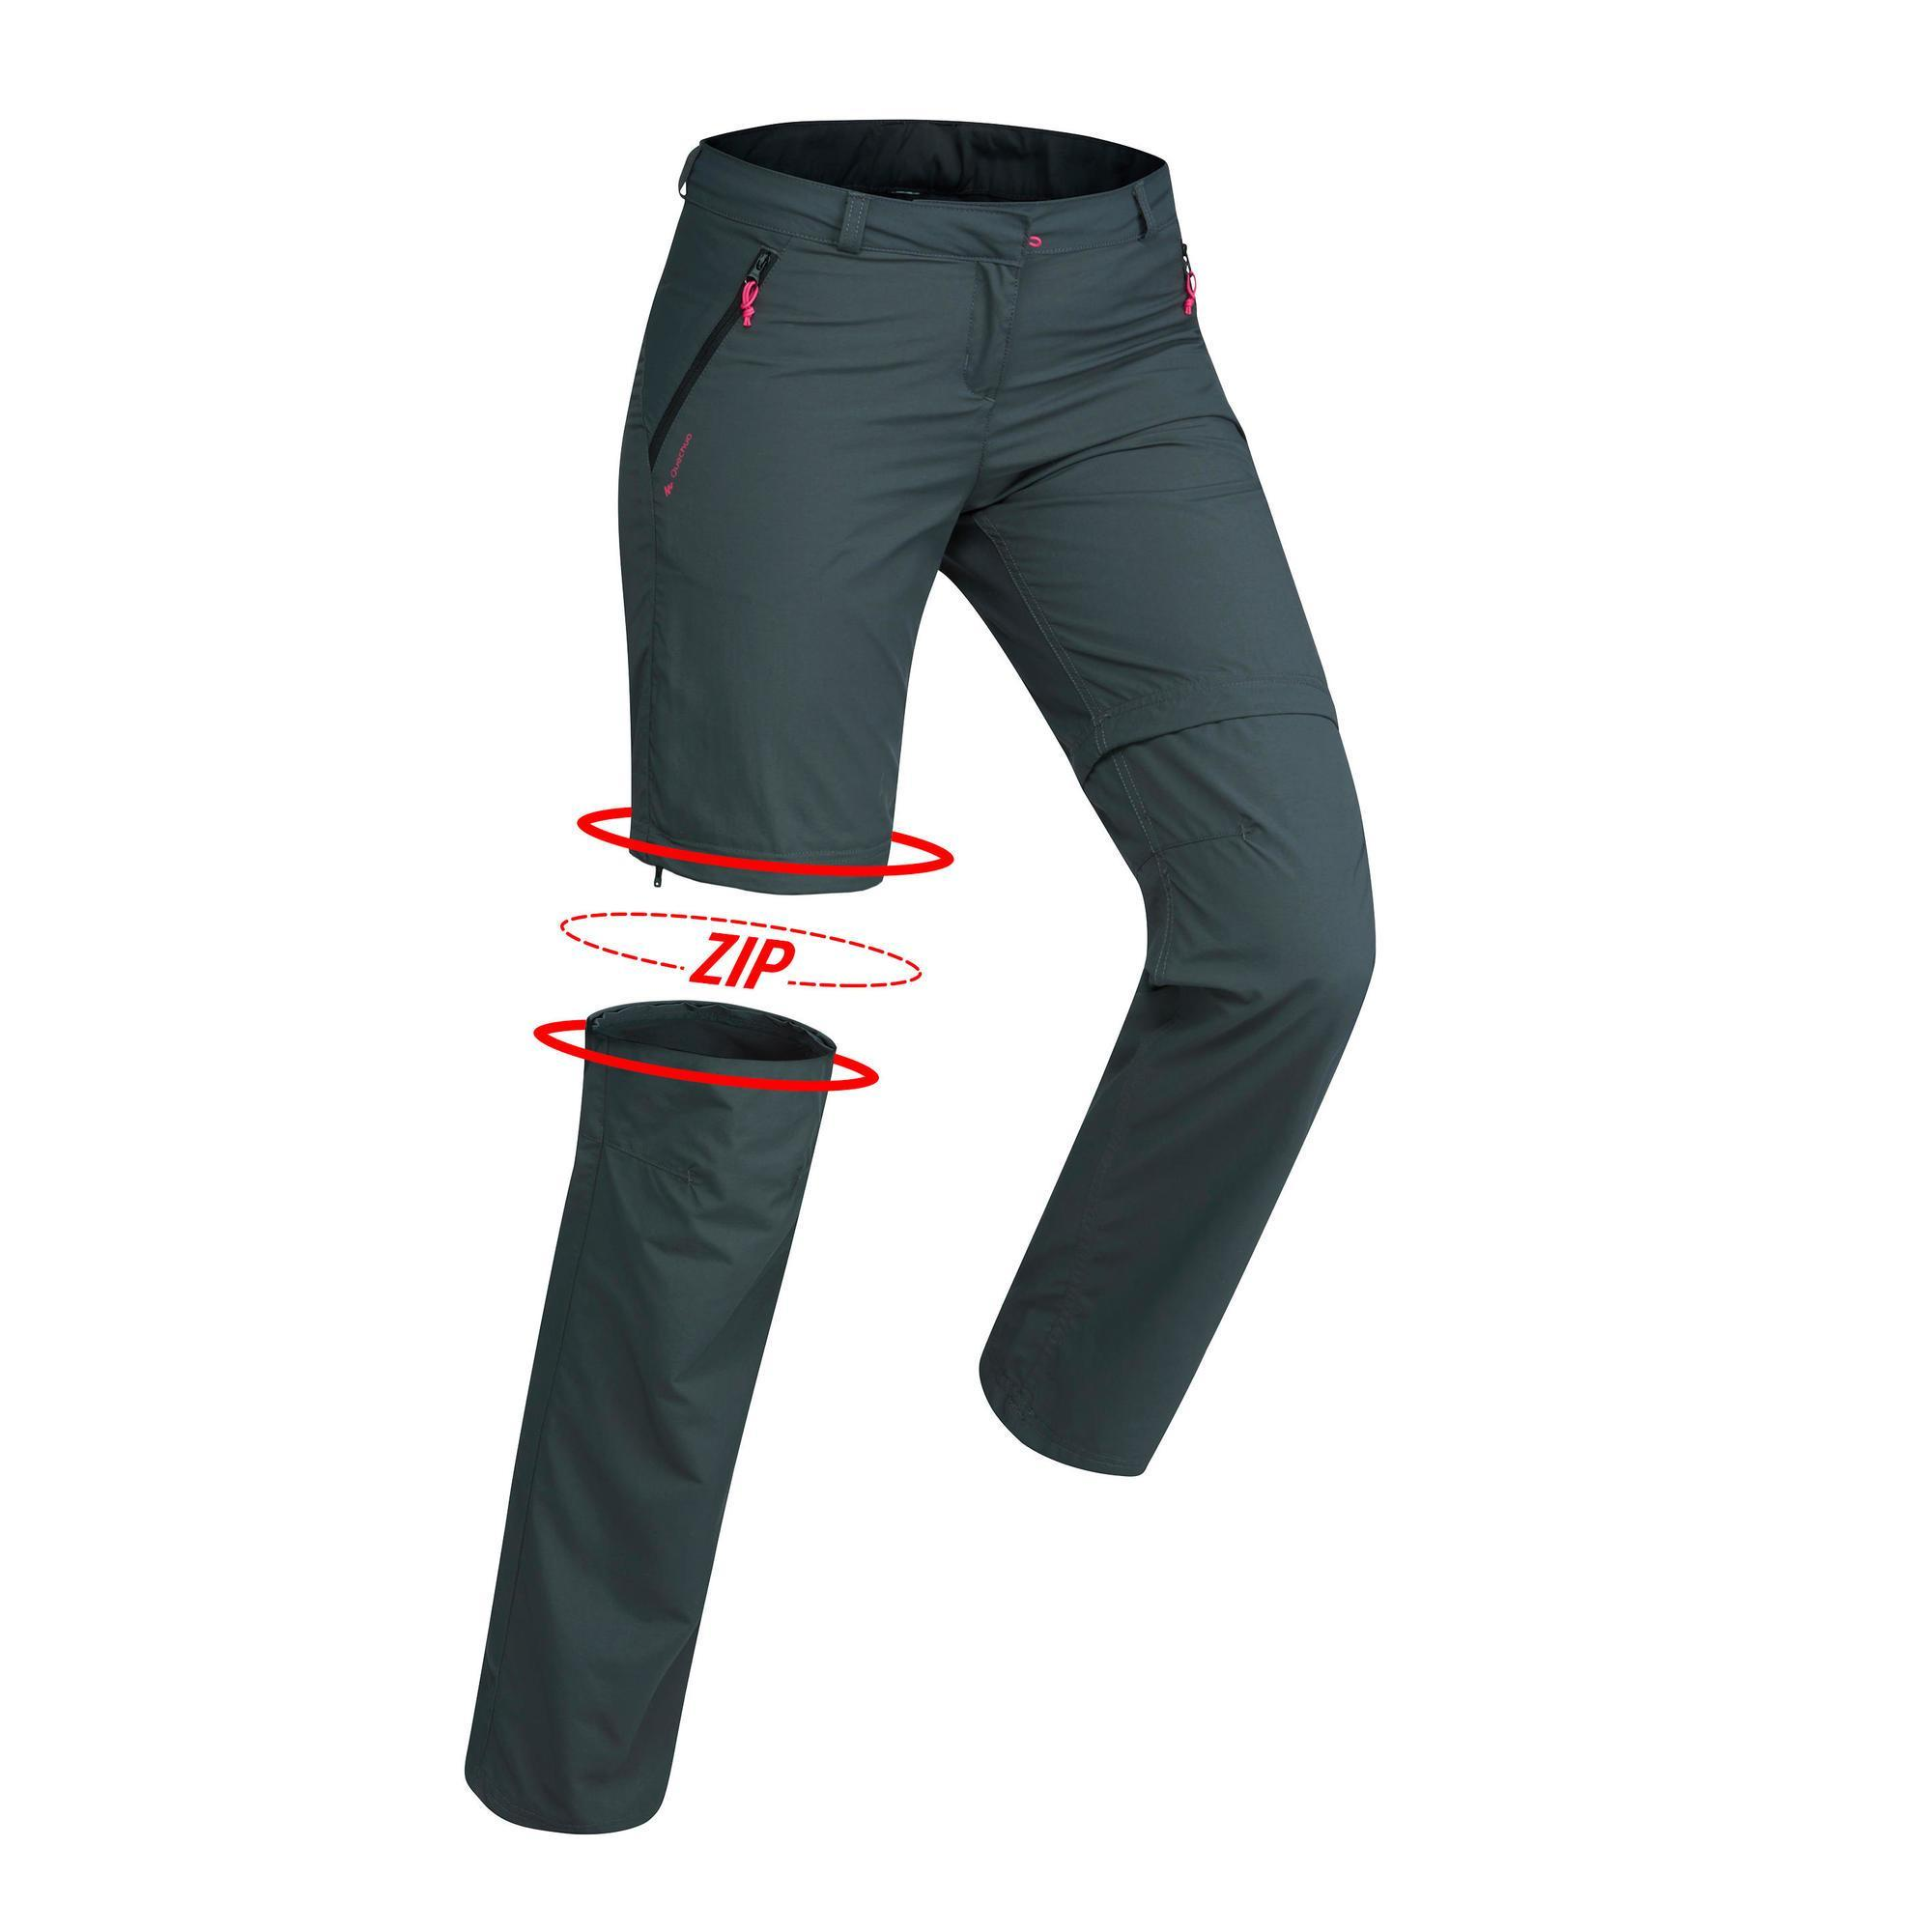 wholesale dealer 2a799 5b63b Sportbekleidung Damen | Günstige Preise | DECATHLON